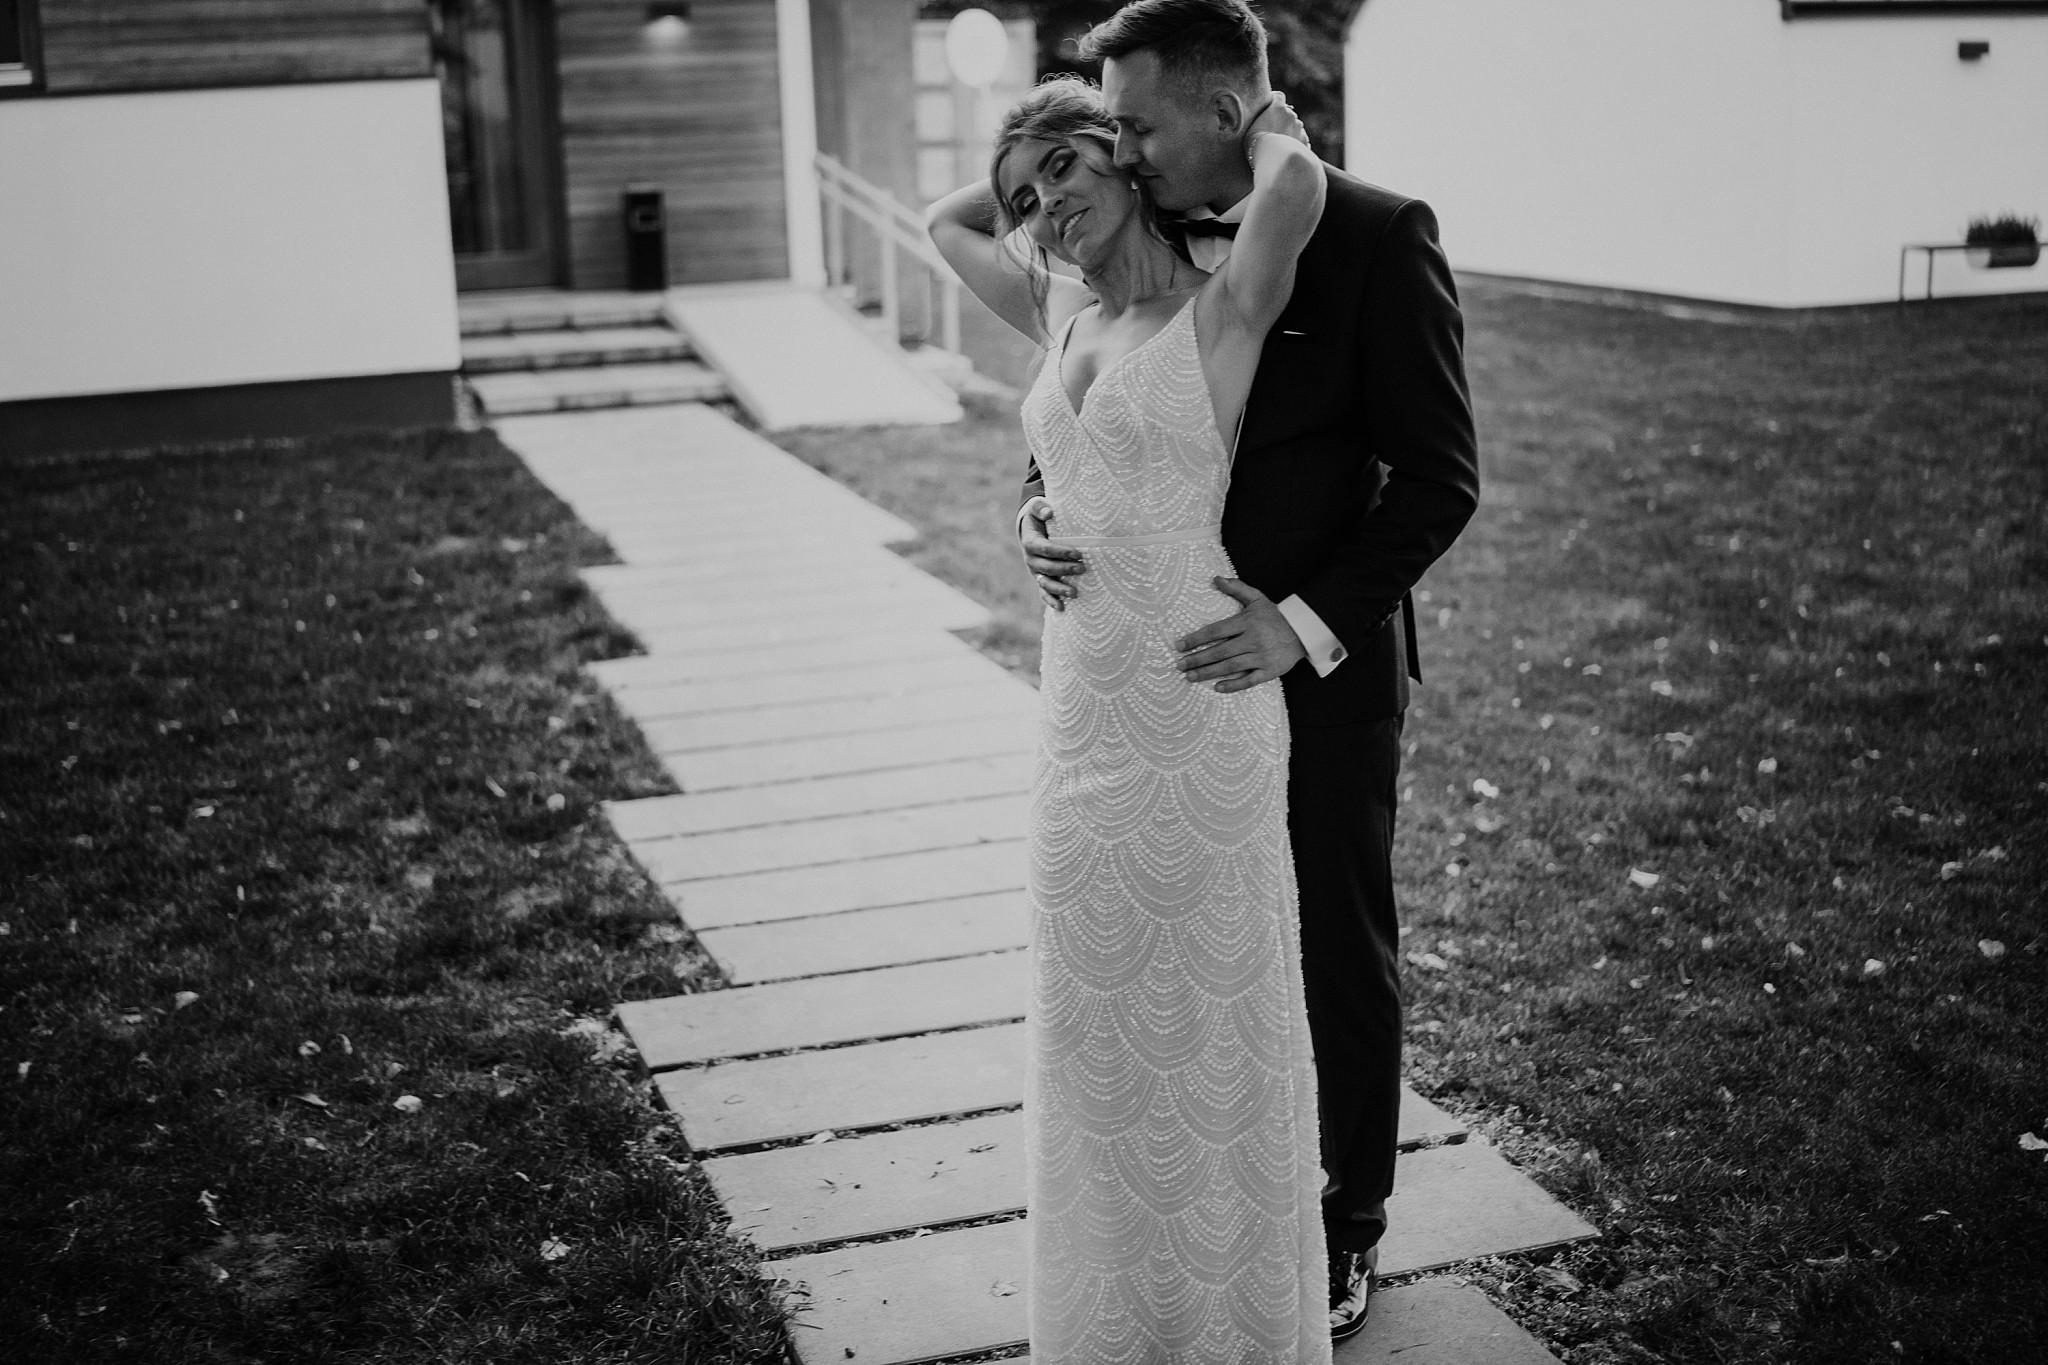 fotograf poznan wesele dobra truskawka piekne wesele pod poznaniem wesele w dobrej truskawce piekna para mloda slub marzen slub koronawirus slub listopad wesele koronawirus 372